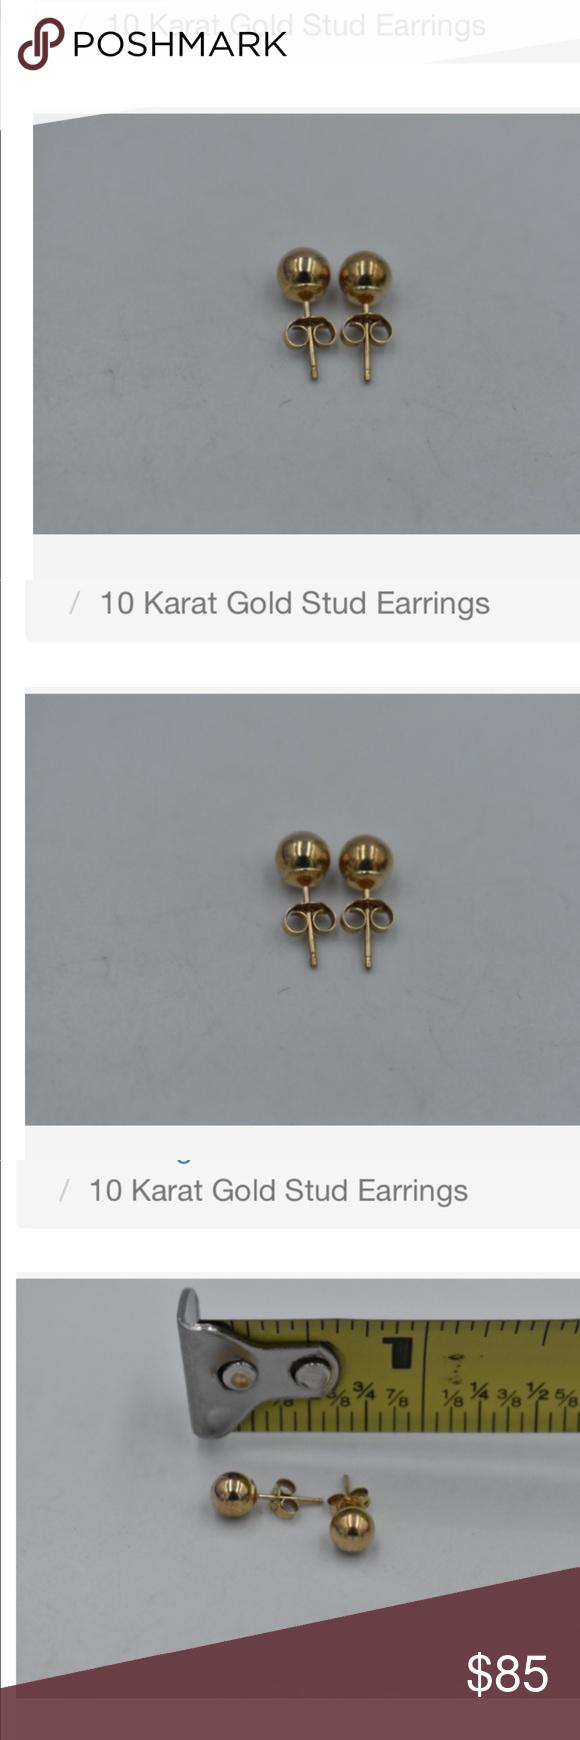 10kt Yellow Gold Earrings Yellow Gold Earring Gold Jewelry Earrings Gold Earrings Studs